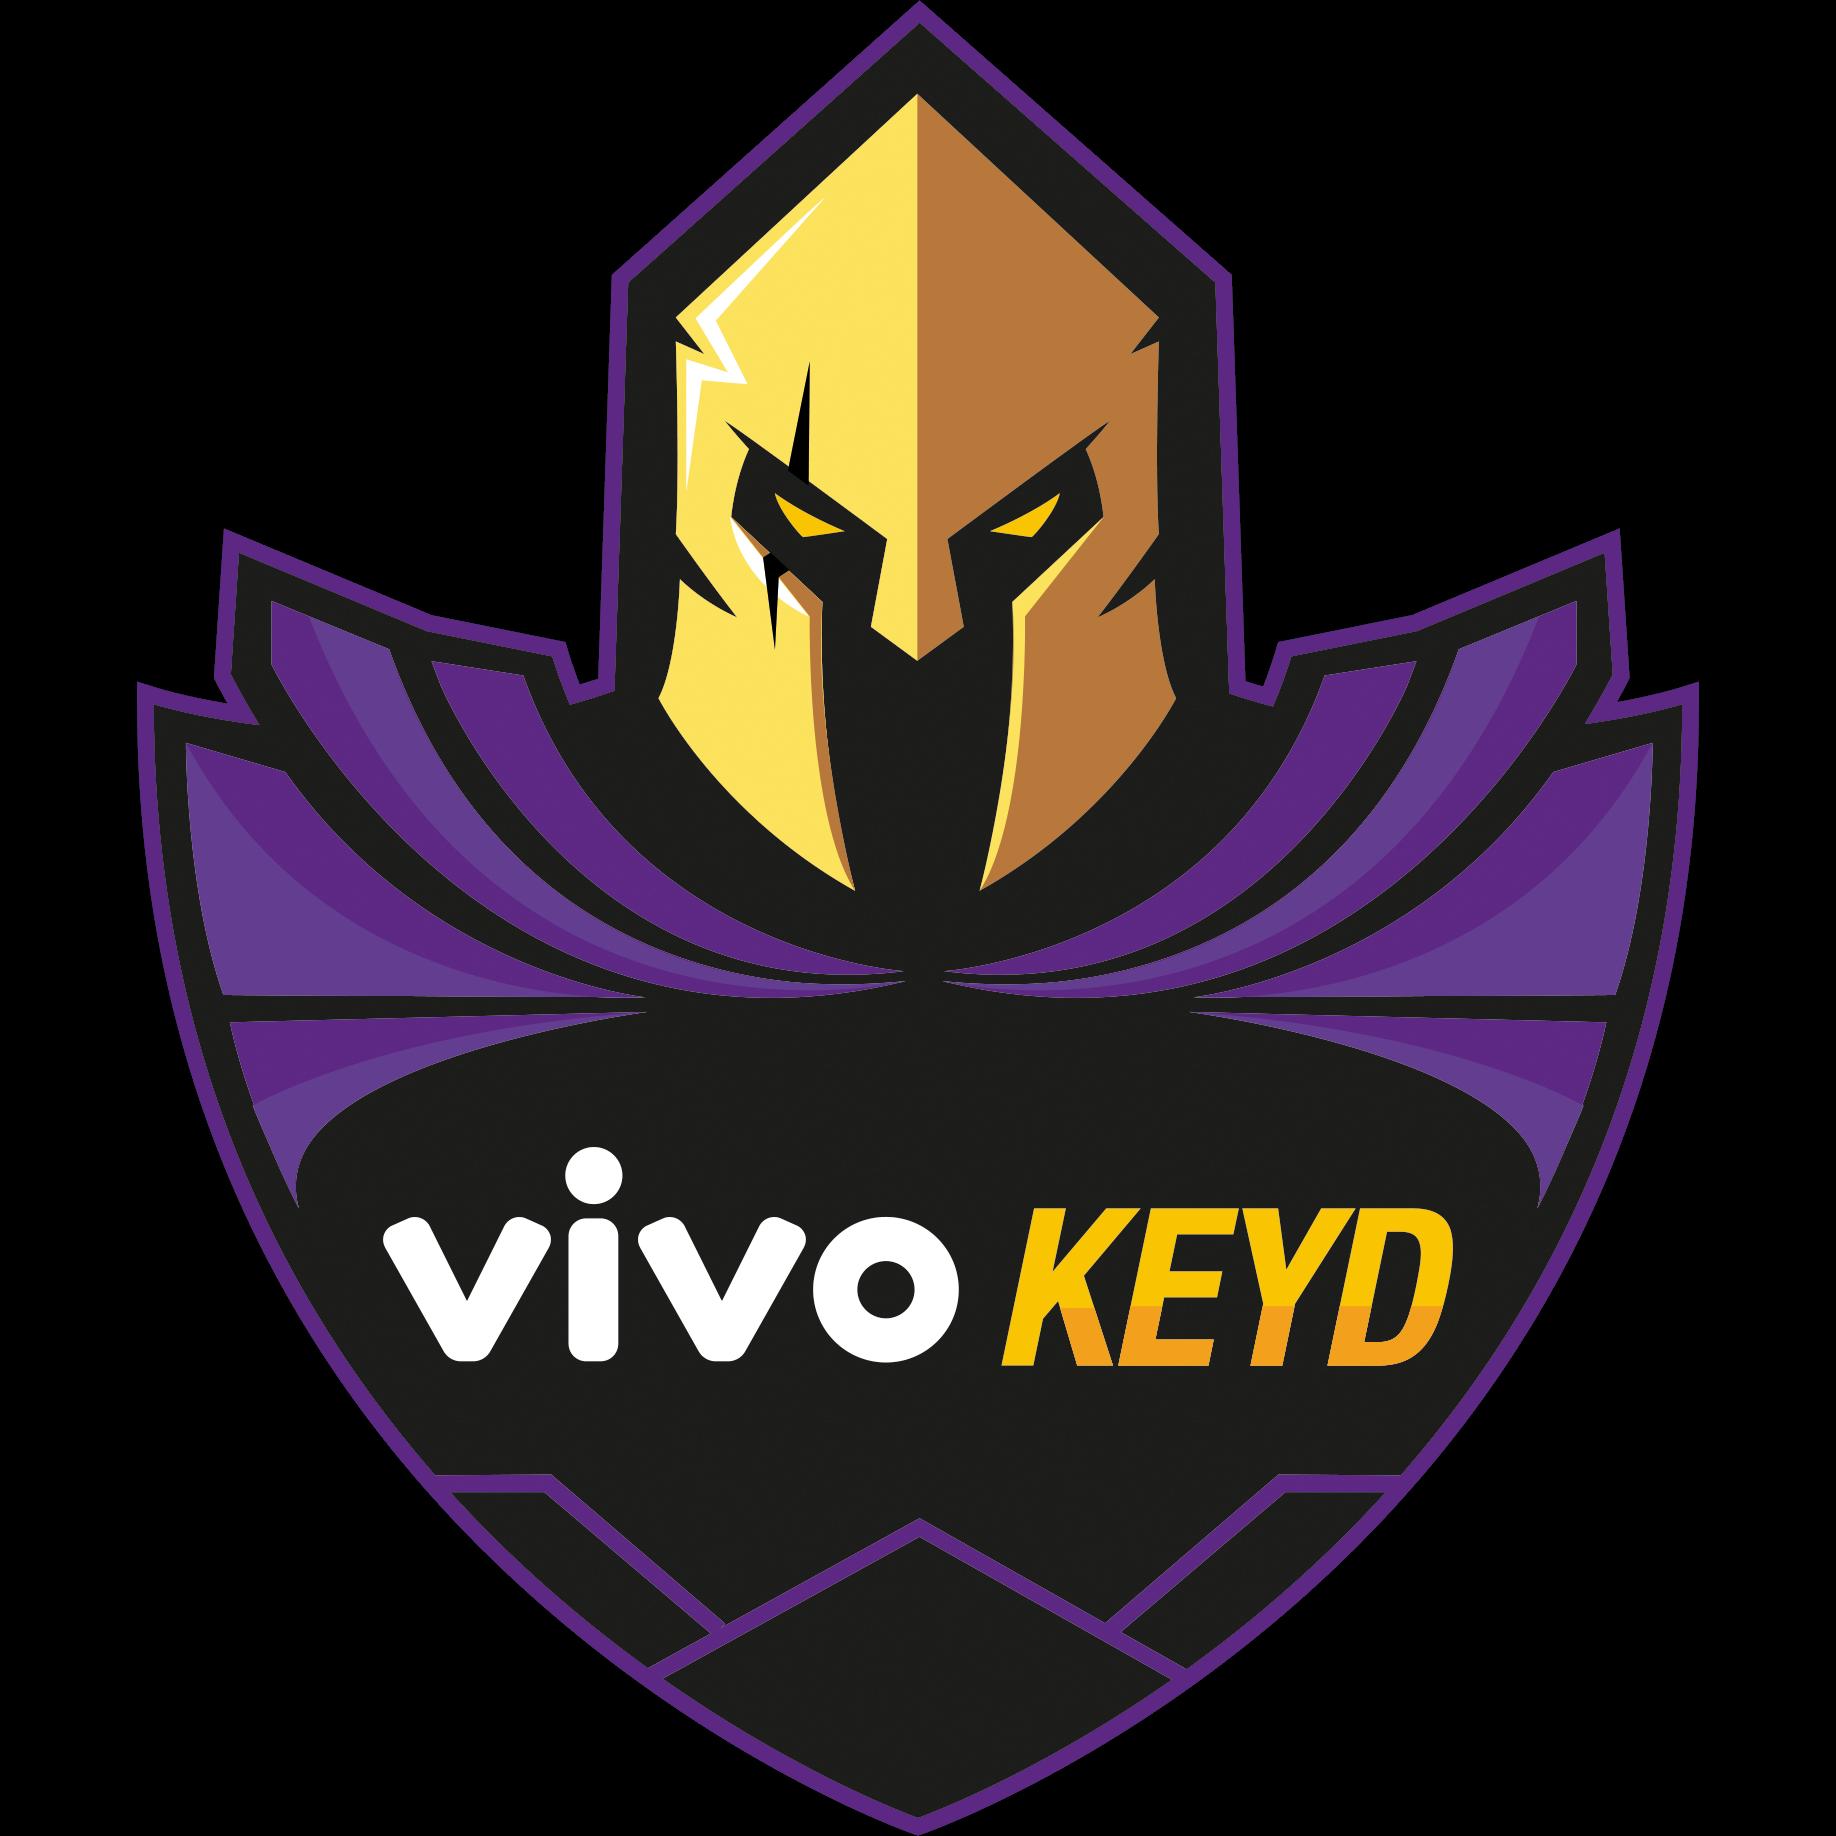 Vivo Keyd Stars Team League of Legends